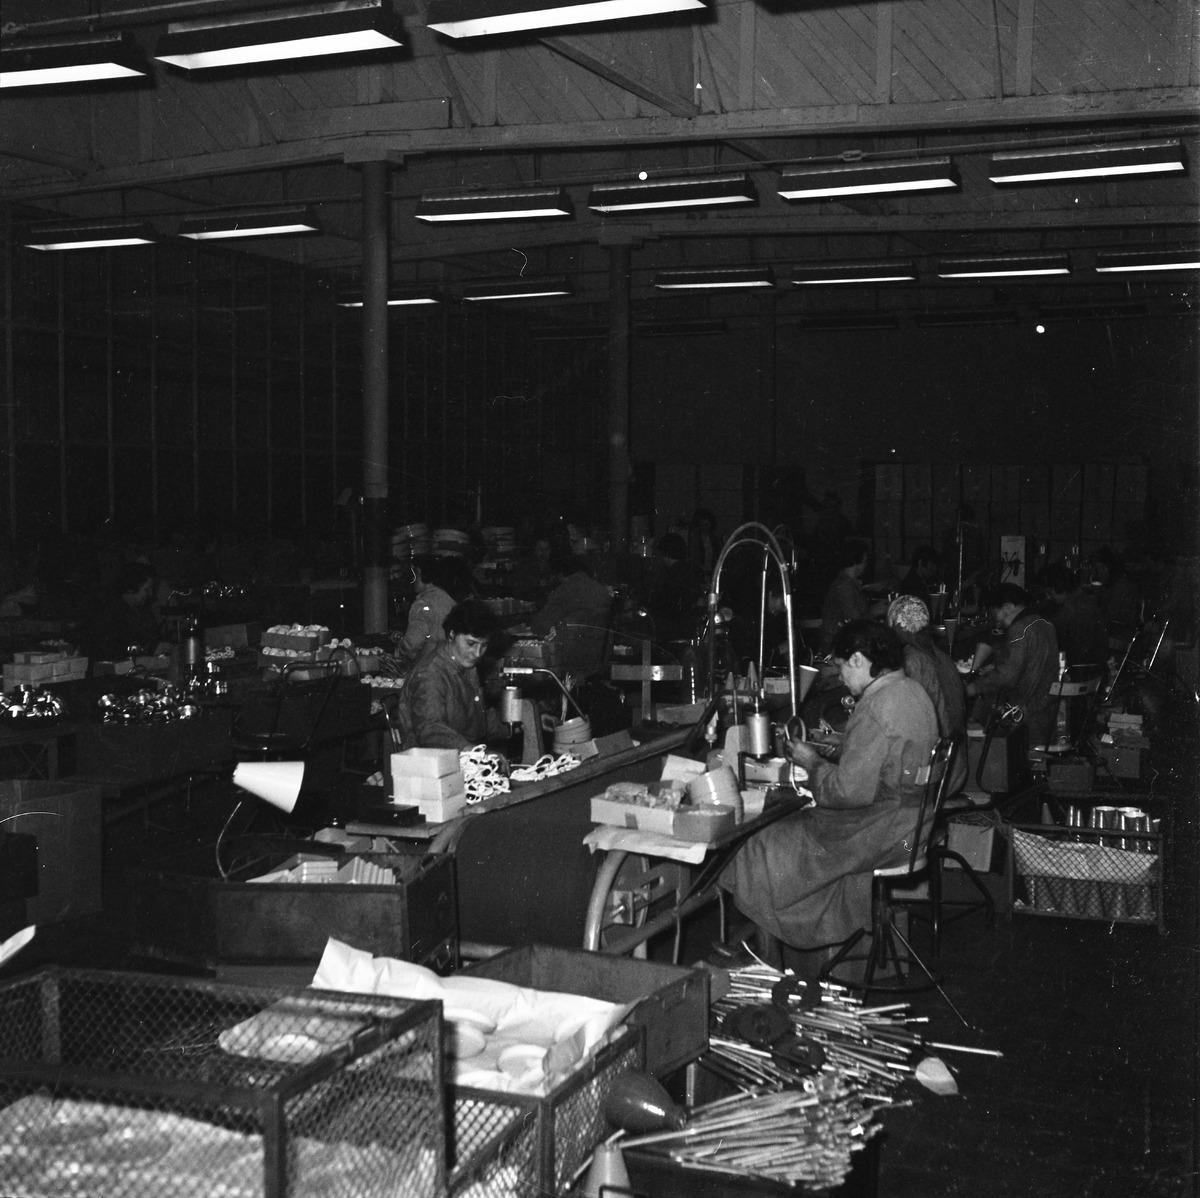 Pracownicy A-23 w Wilkasach [1]